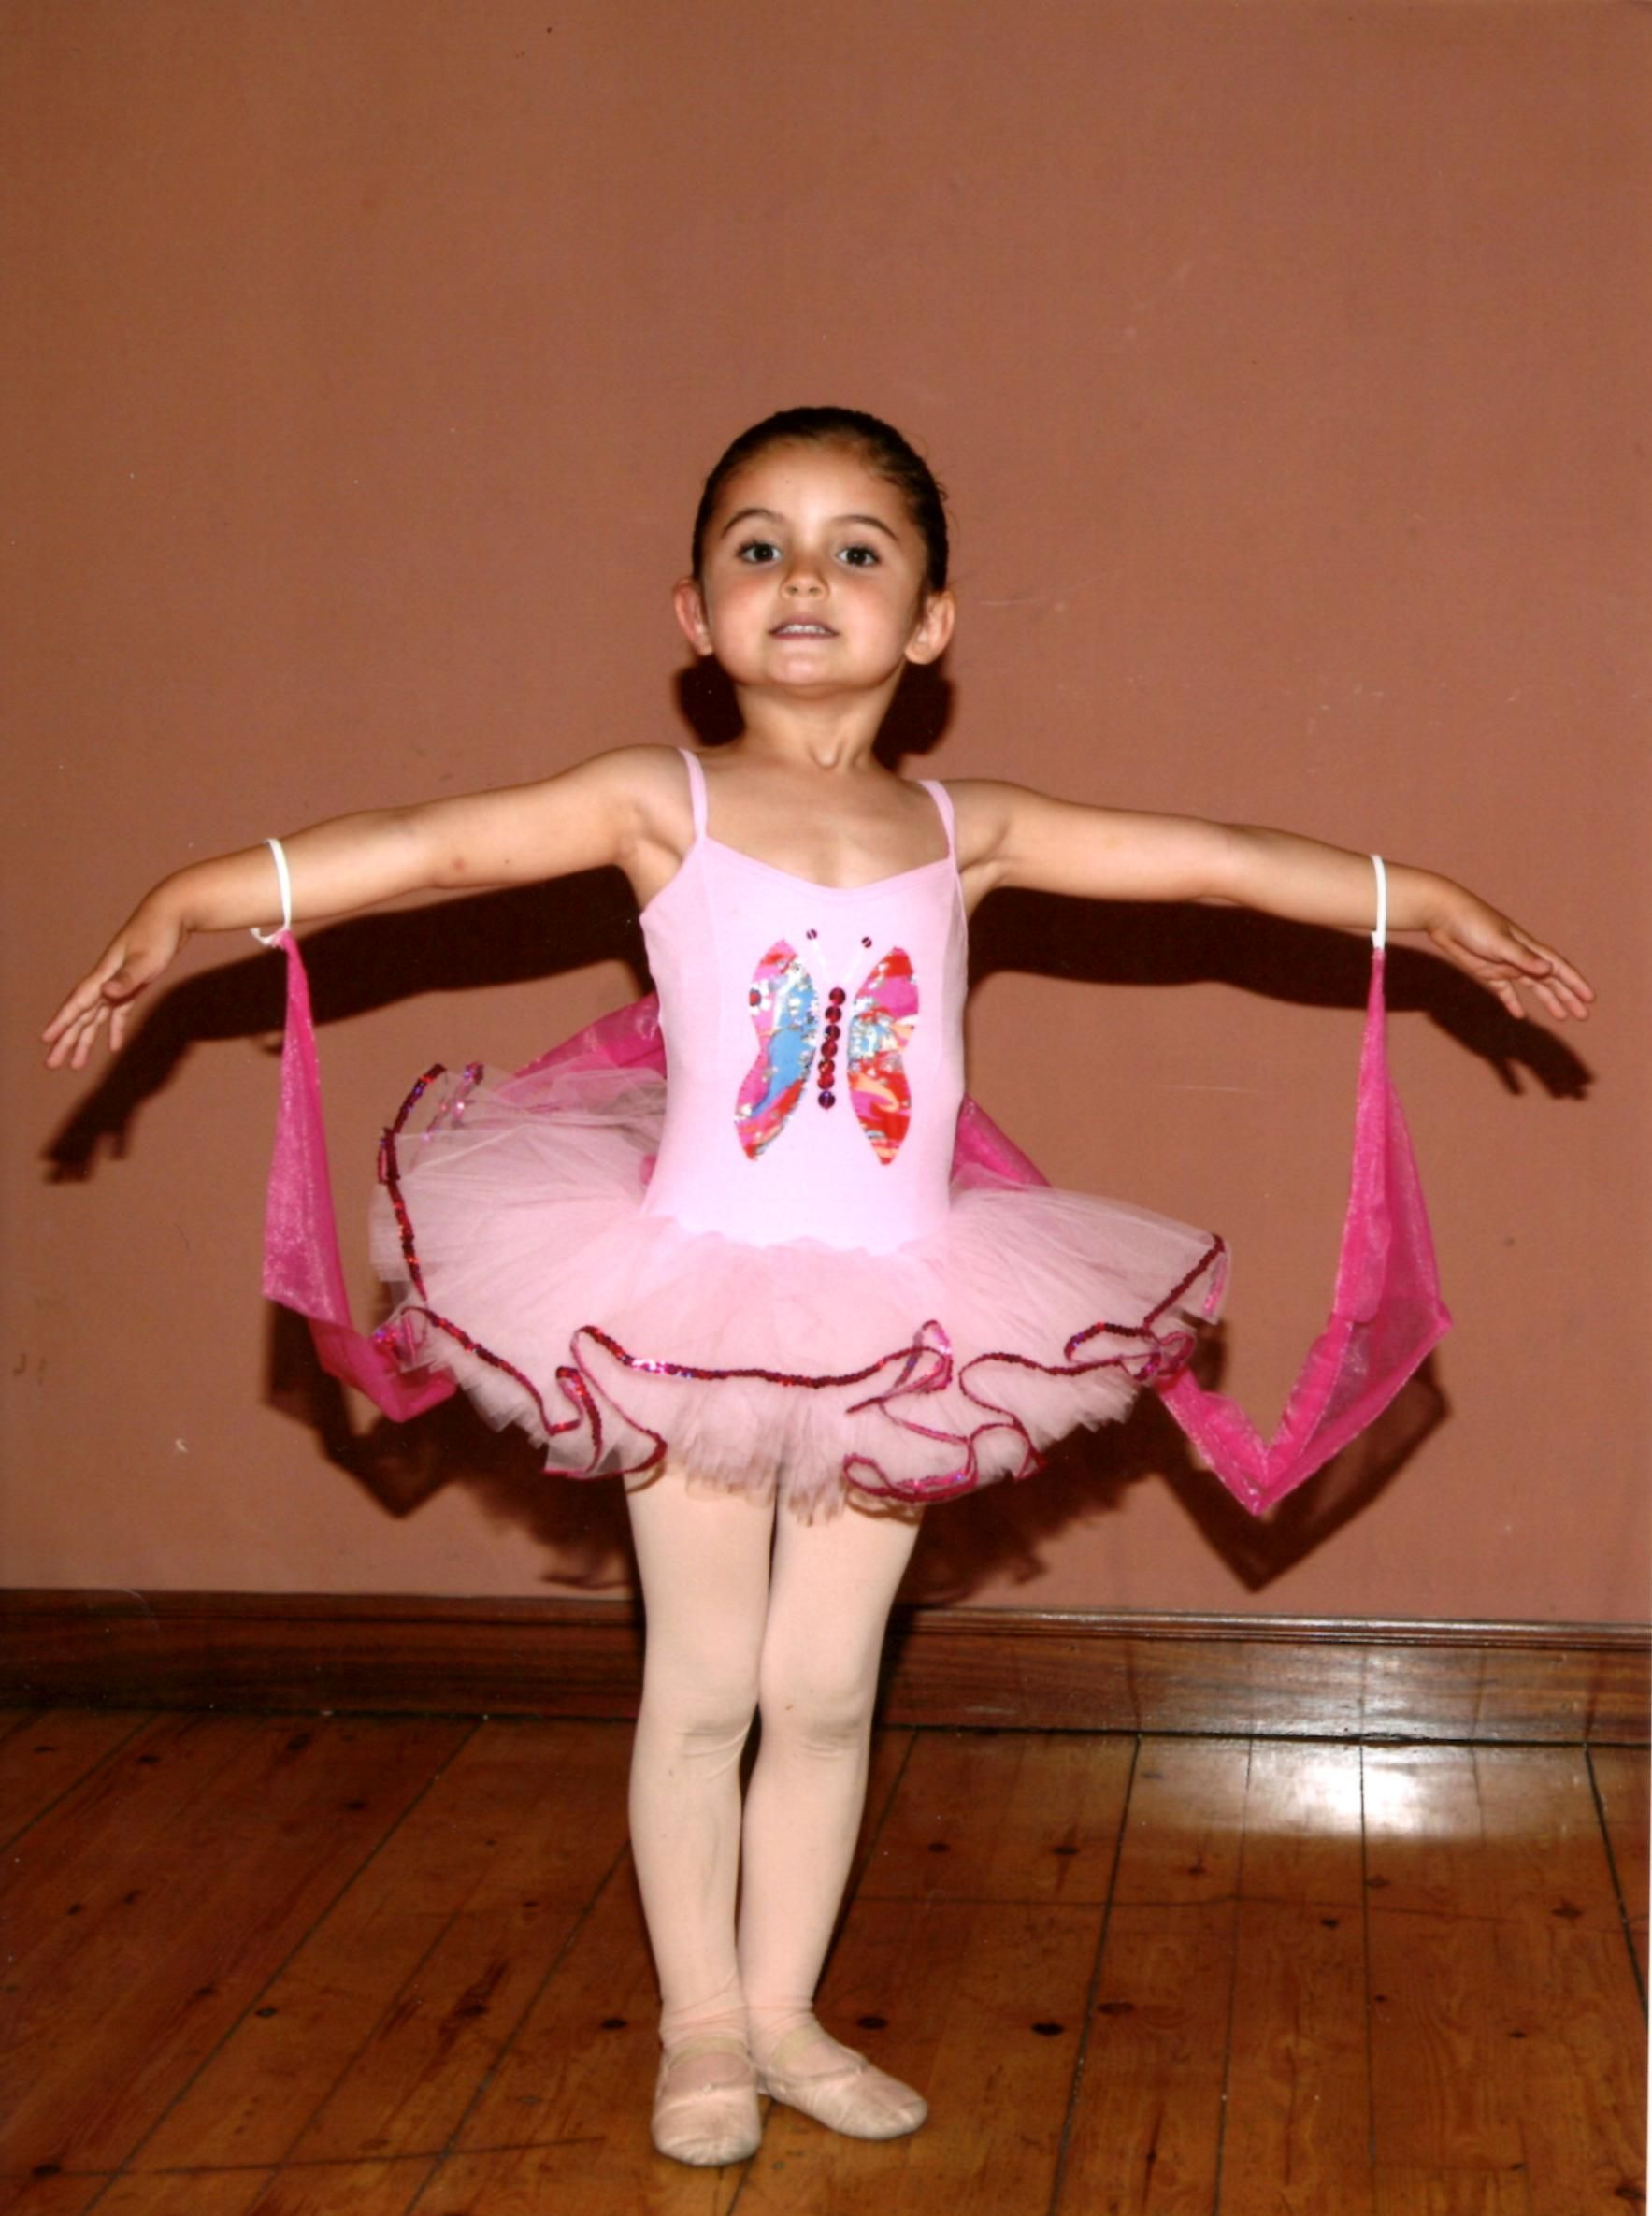 Foto 27 de Escuelas de música, danza e interpretación en Bilbao | Estudio de Ballet Ana Mª Aurrecoechea